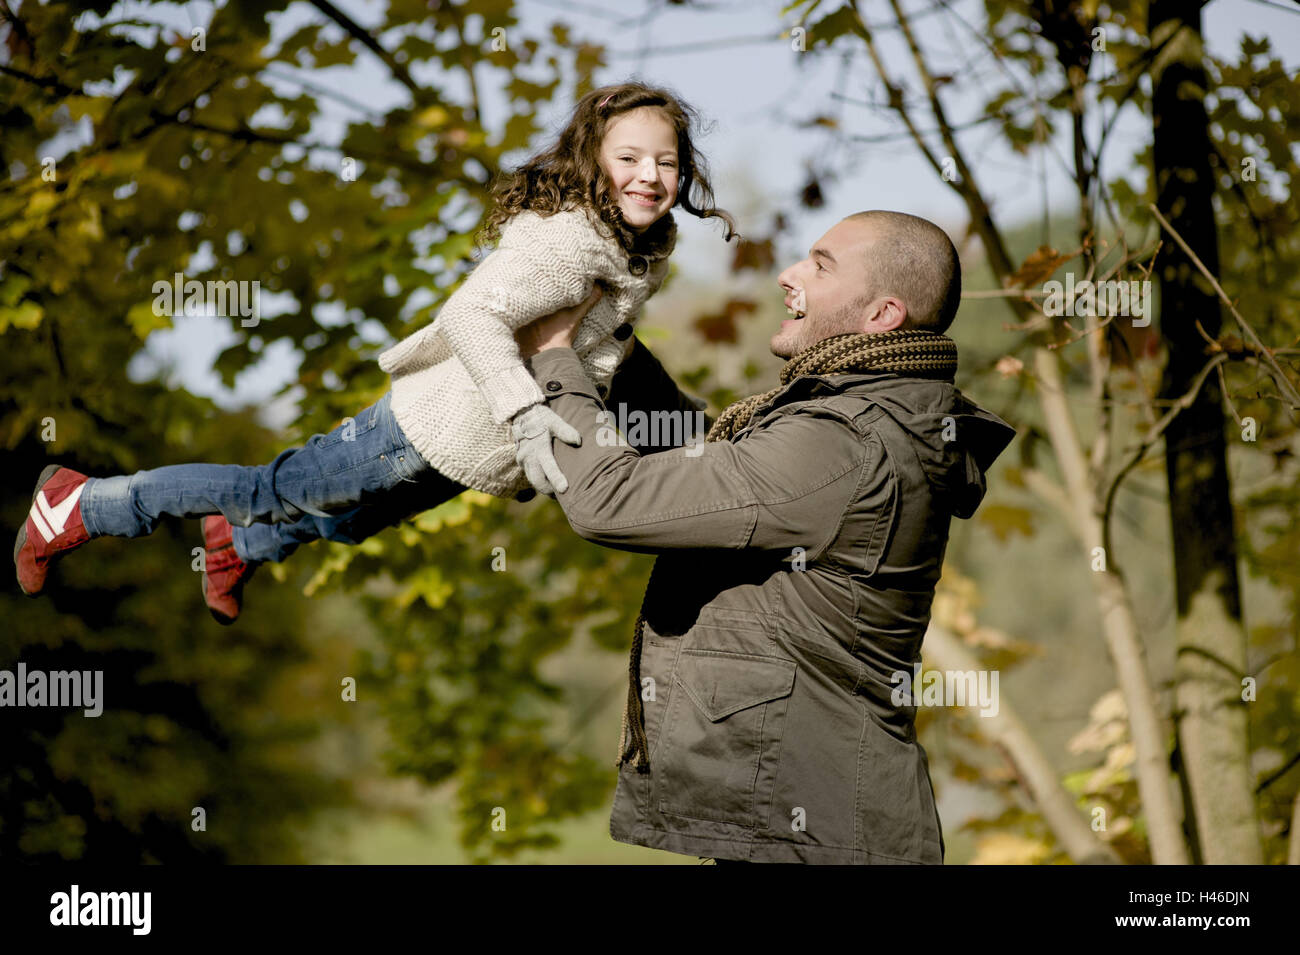 Father lifts subsidiary upwards, - Stock Image